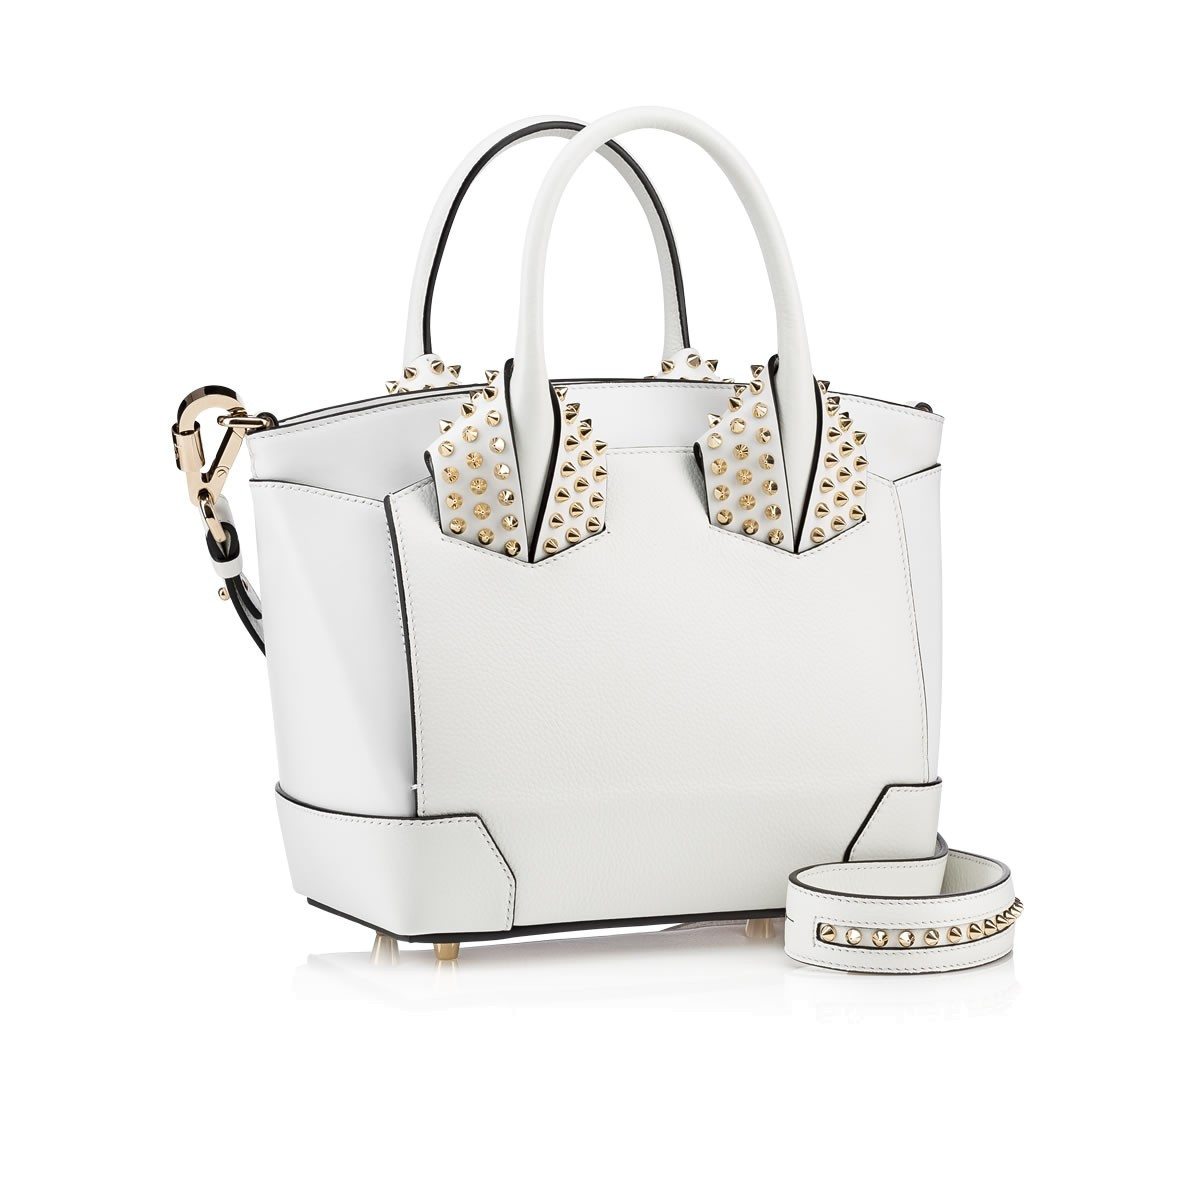 Foto de El nuevo 'it bag' de Christian Louboutin se llama 'Eloise' (4/8)